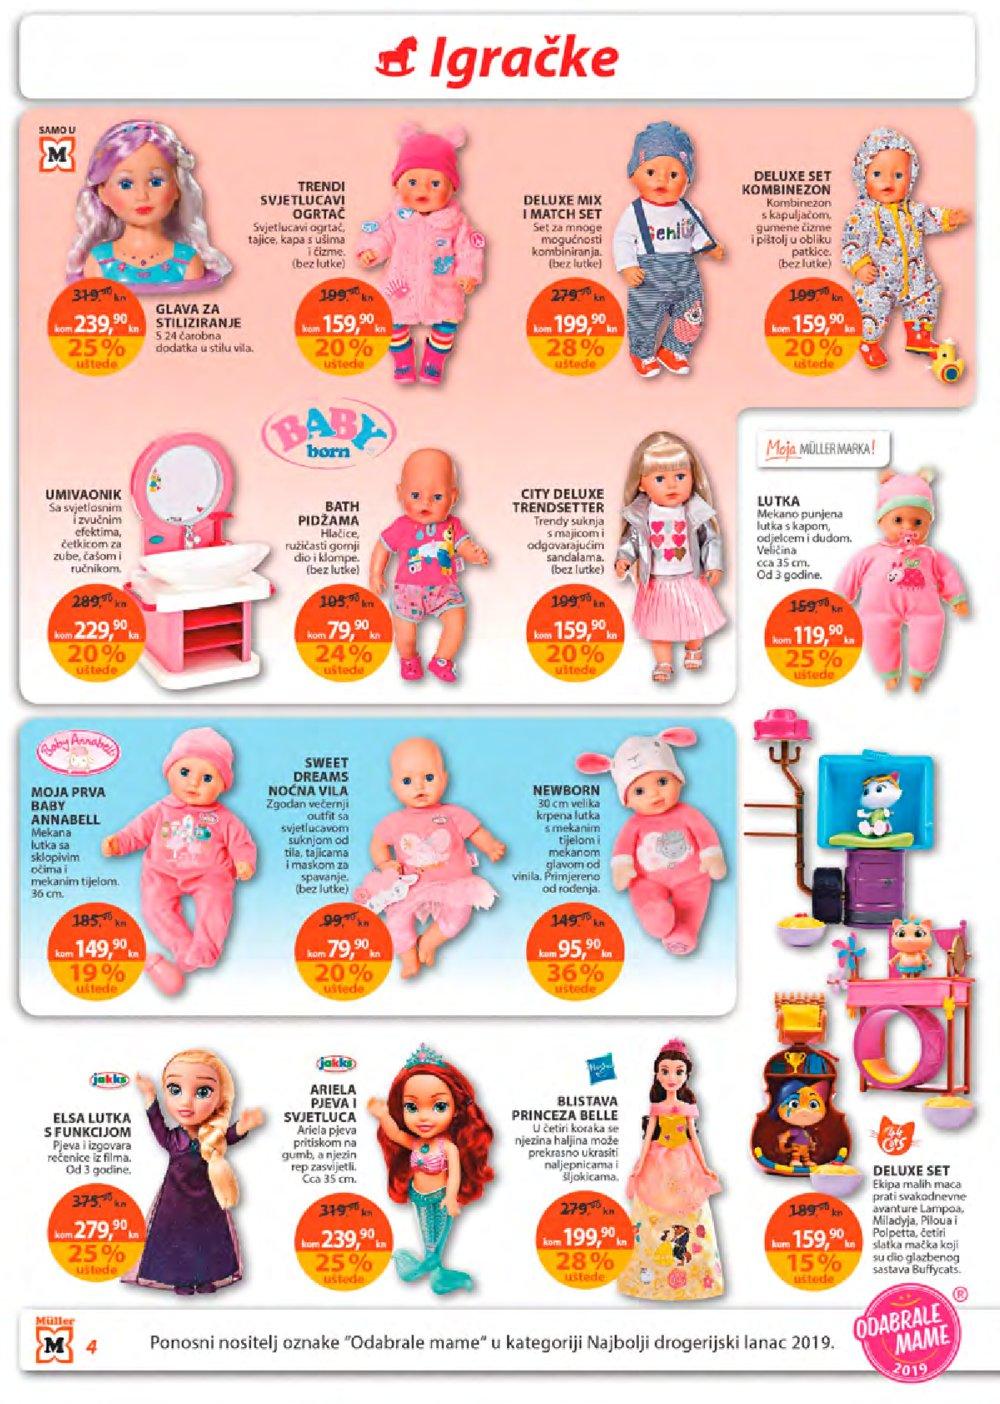 Muller katalog Akcija igračaka 5.12.-18.12.2019.